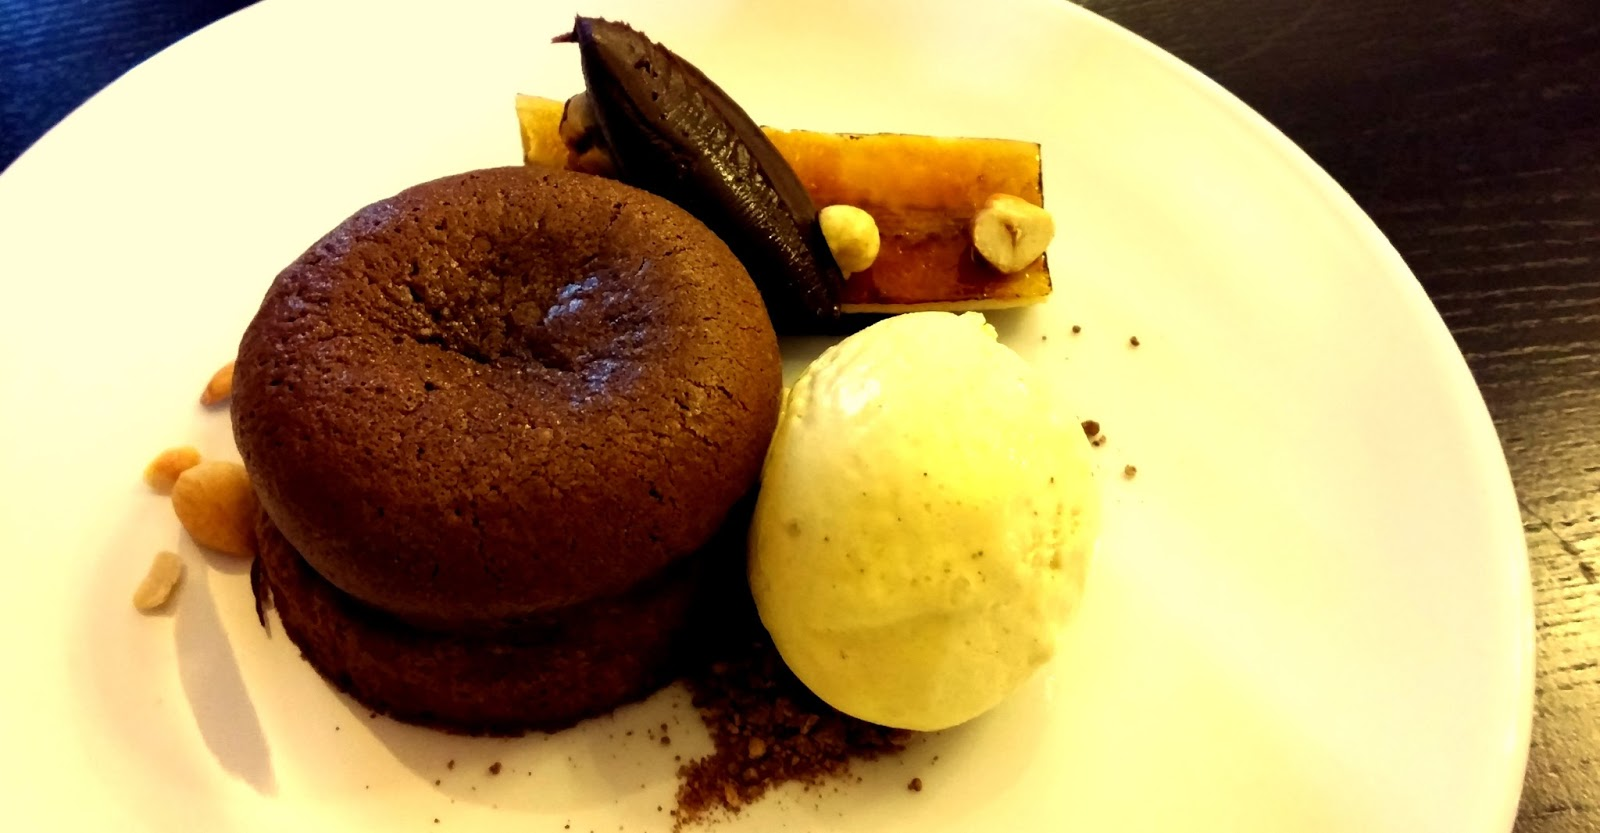 chocolate fondant with glazed banana and roasted hazelnuts at oak tree restaurant bluestone wales